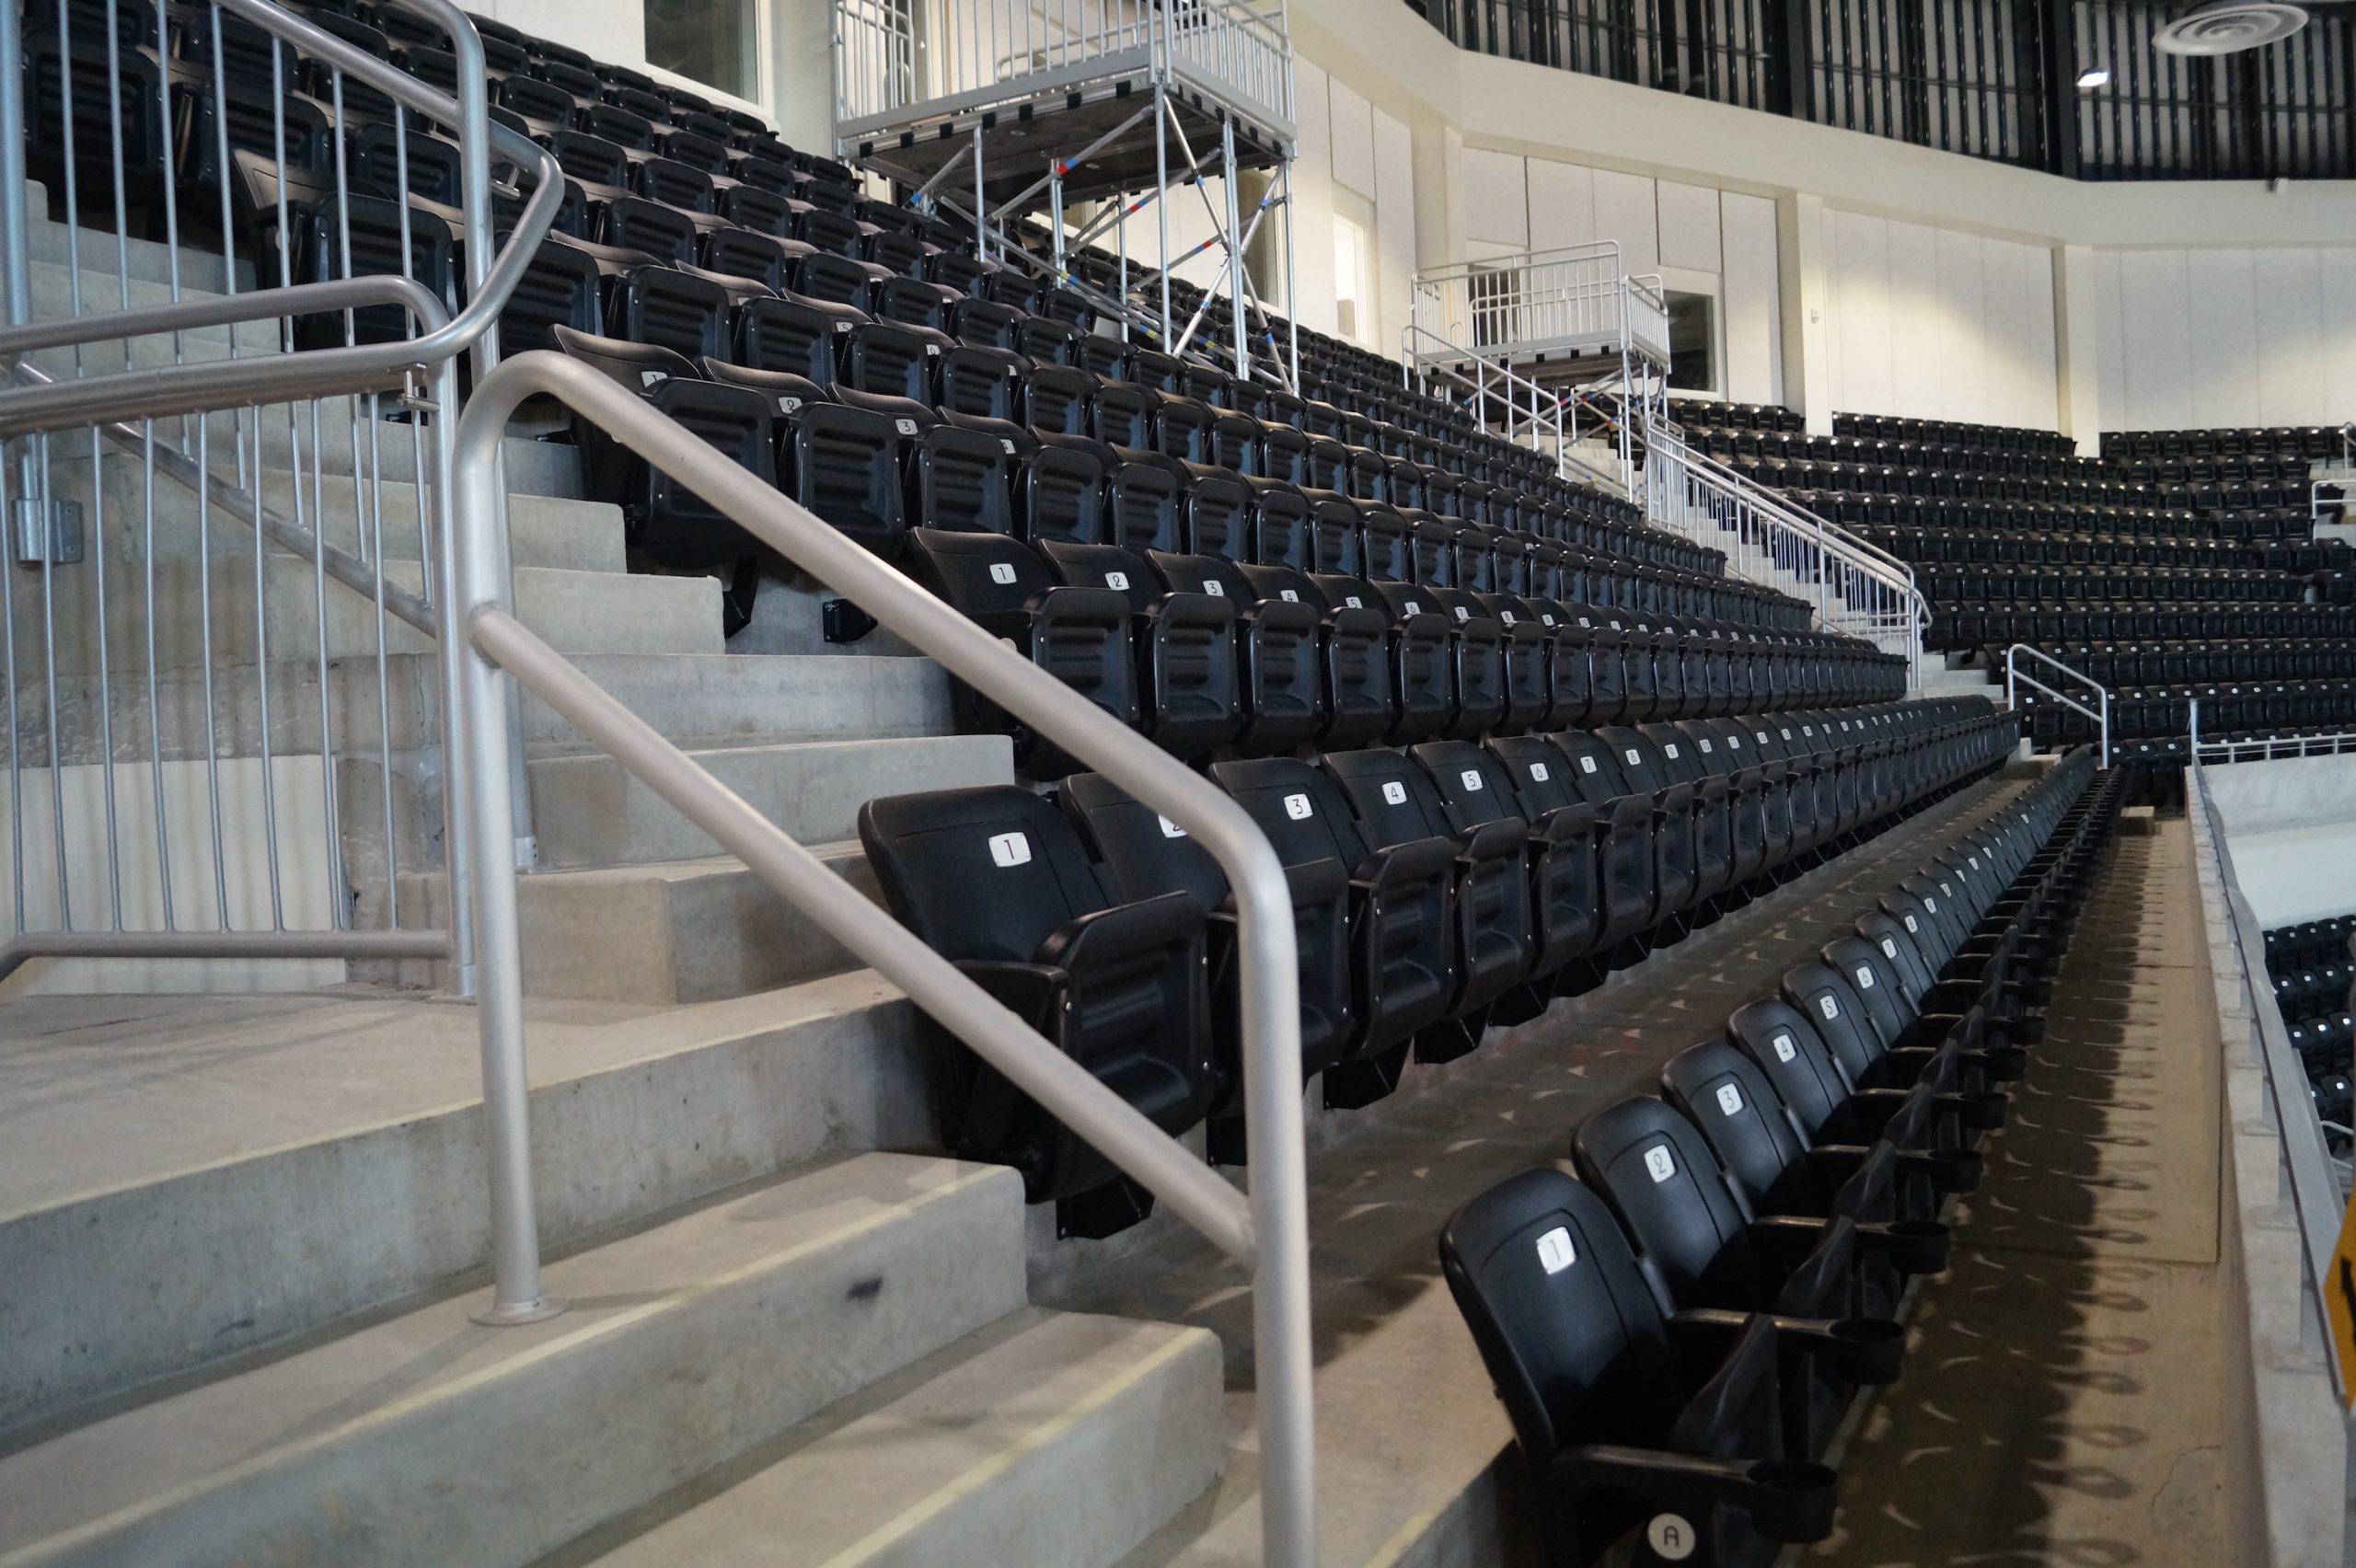 Stadium risers at UMBC's basketball stadium